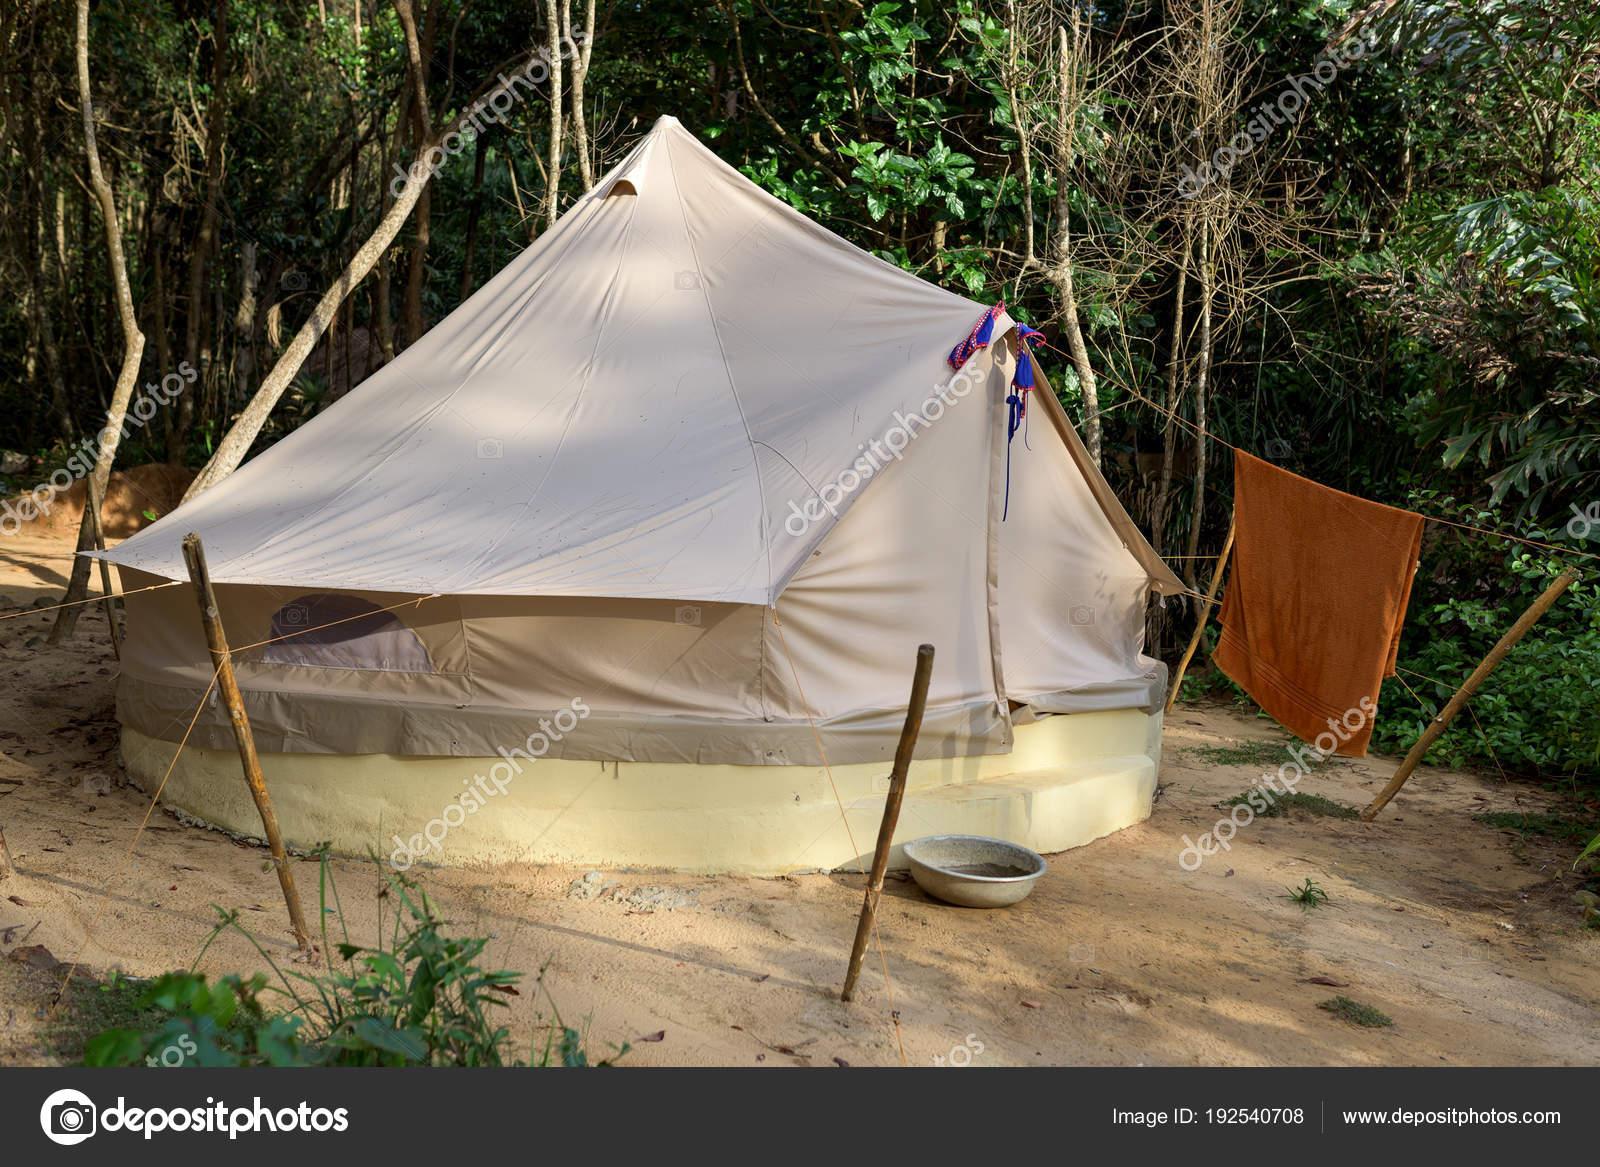 4257567f9 Crema gran carpa turística en la playa cerca de la selva. Isla de Koh Rong  Samloem, Sunset Beach.